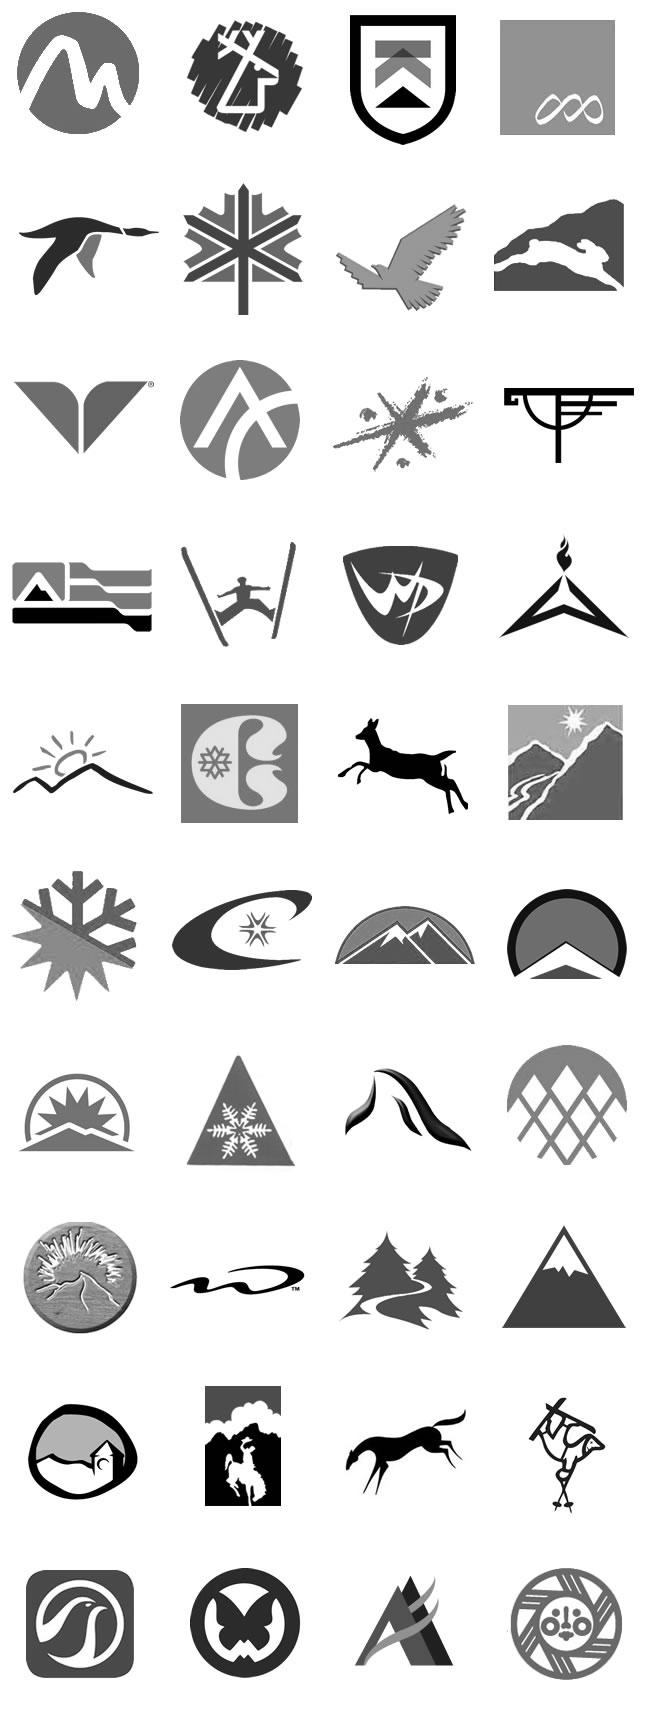 Super Ski Brand Quiz: Can You Identify These 40 Resort ...